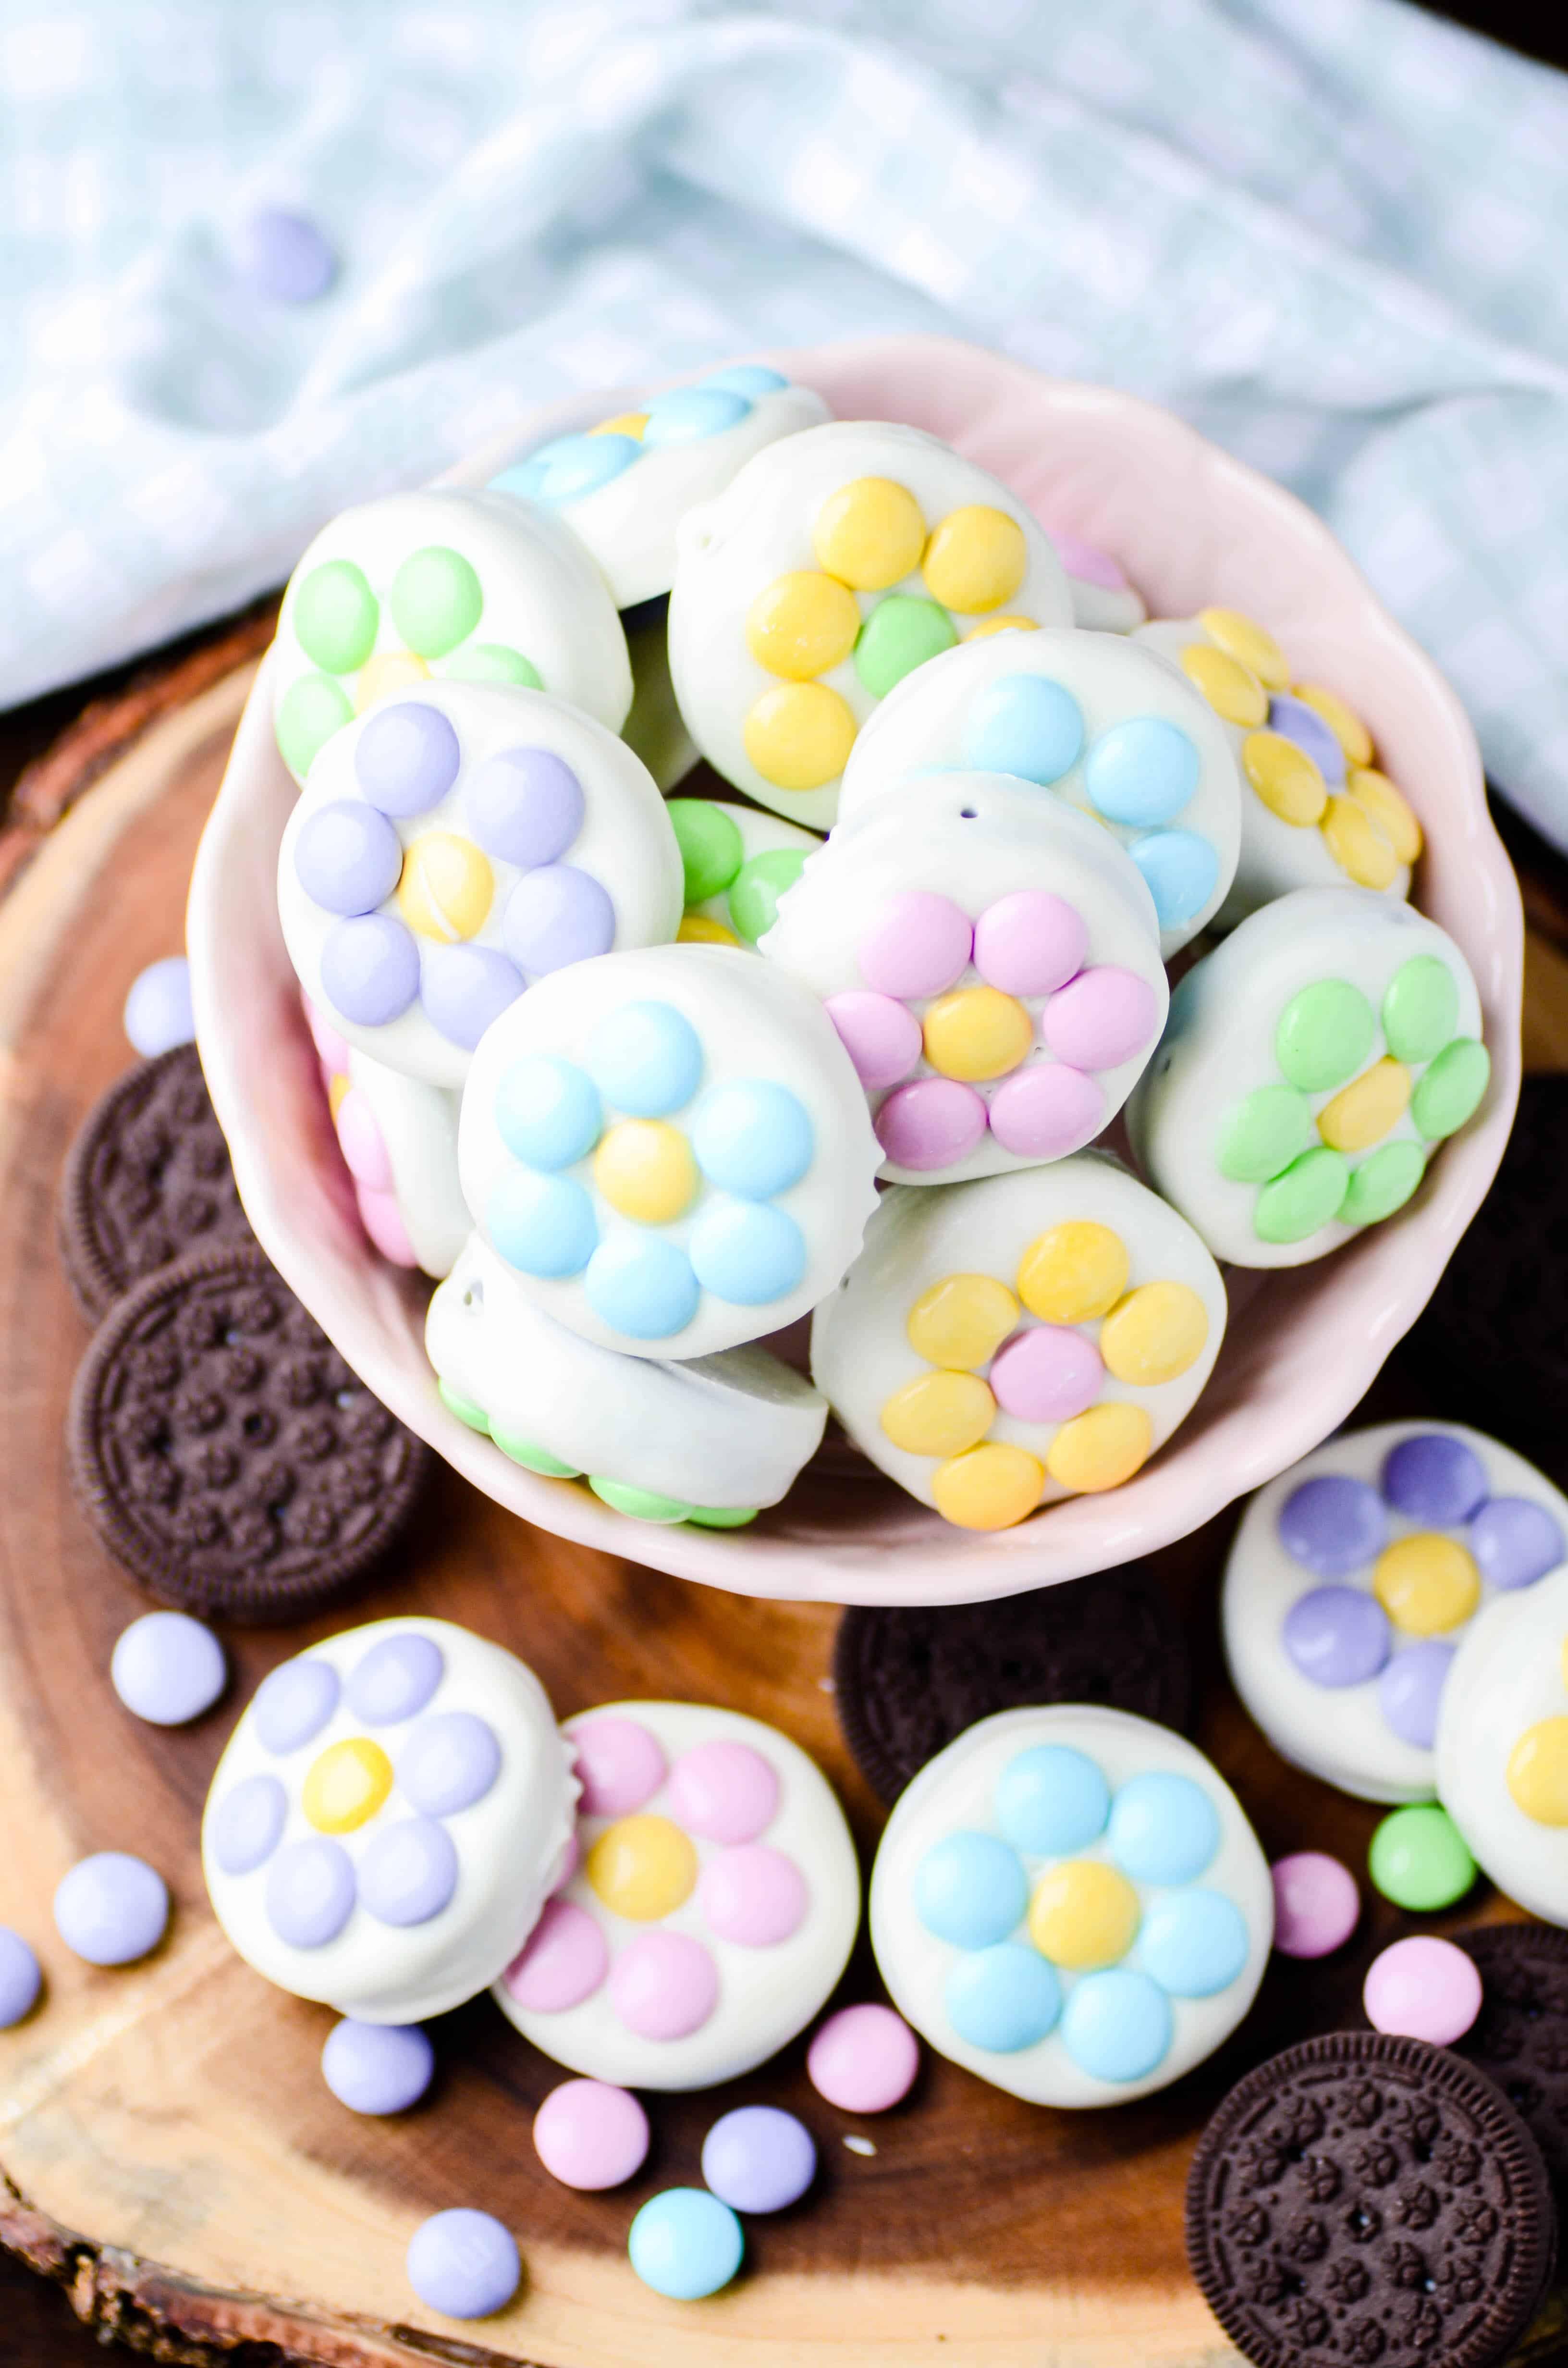 White Chocolate Covered Oreos Spring Flowers